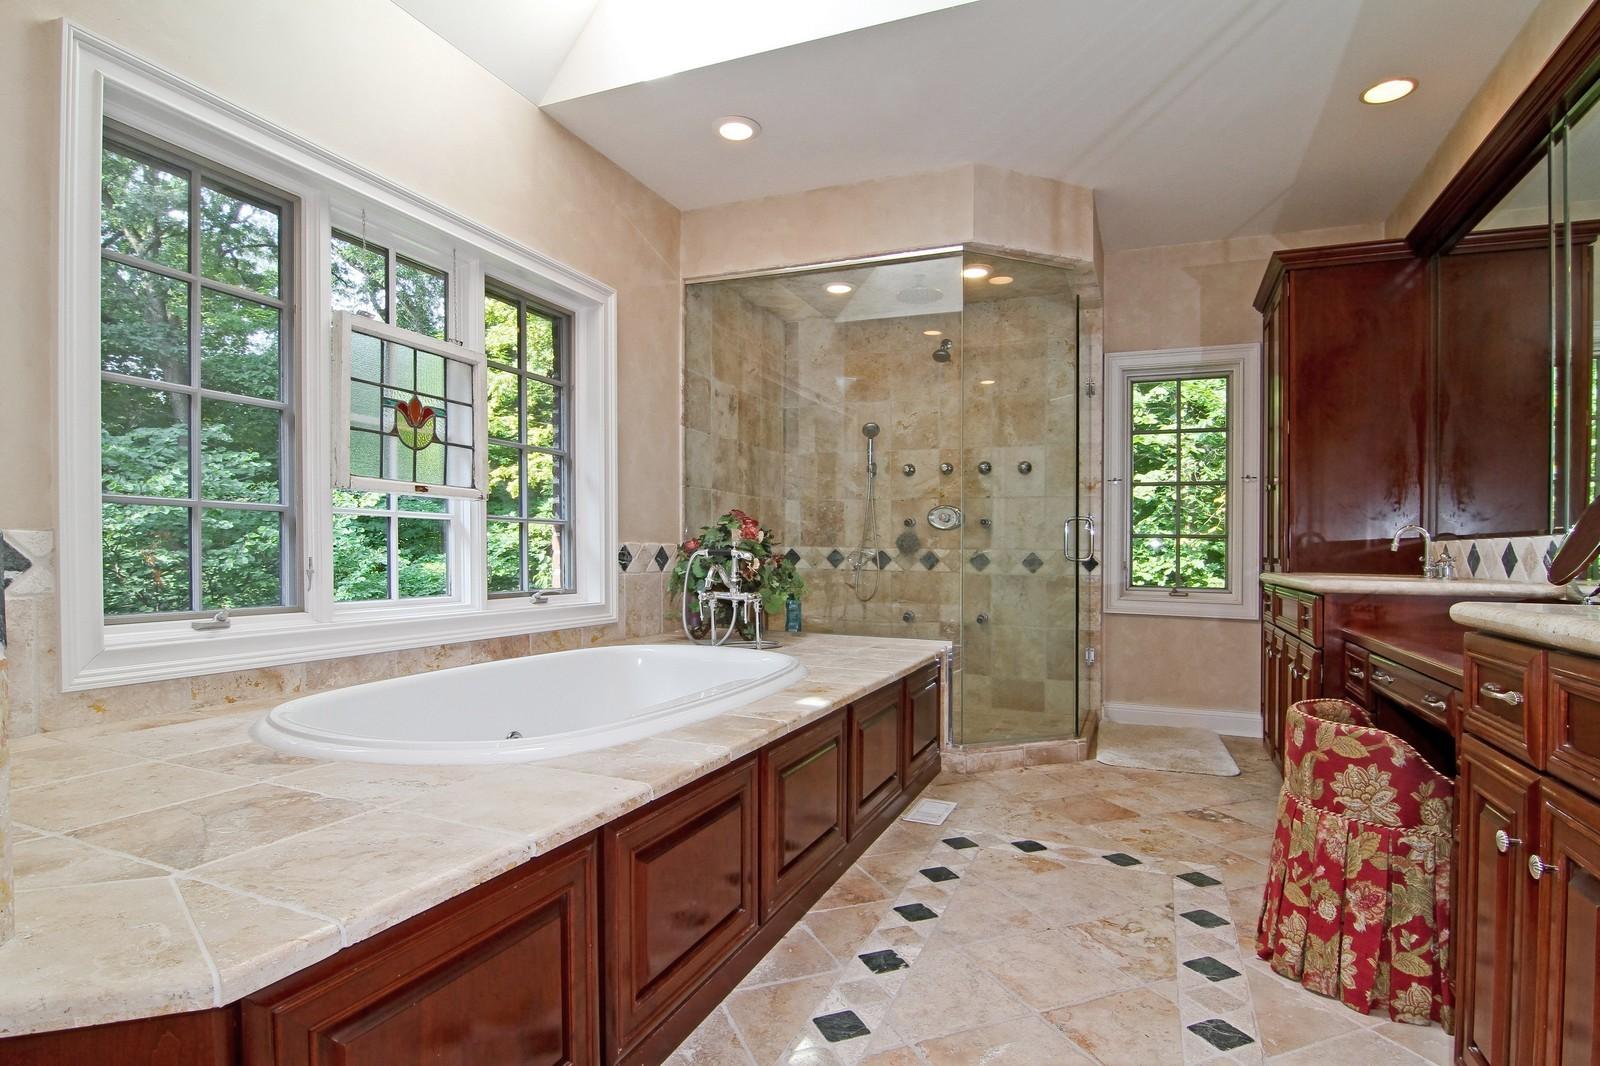 Real Estate Photography - 2901 Glenbriar Dr, St Charles, IL, 60174 - Master Bathroom